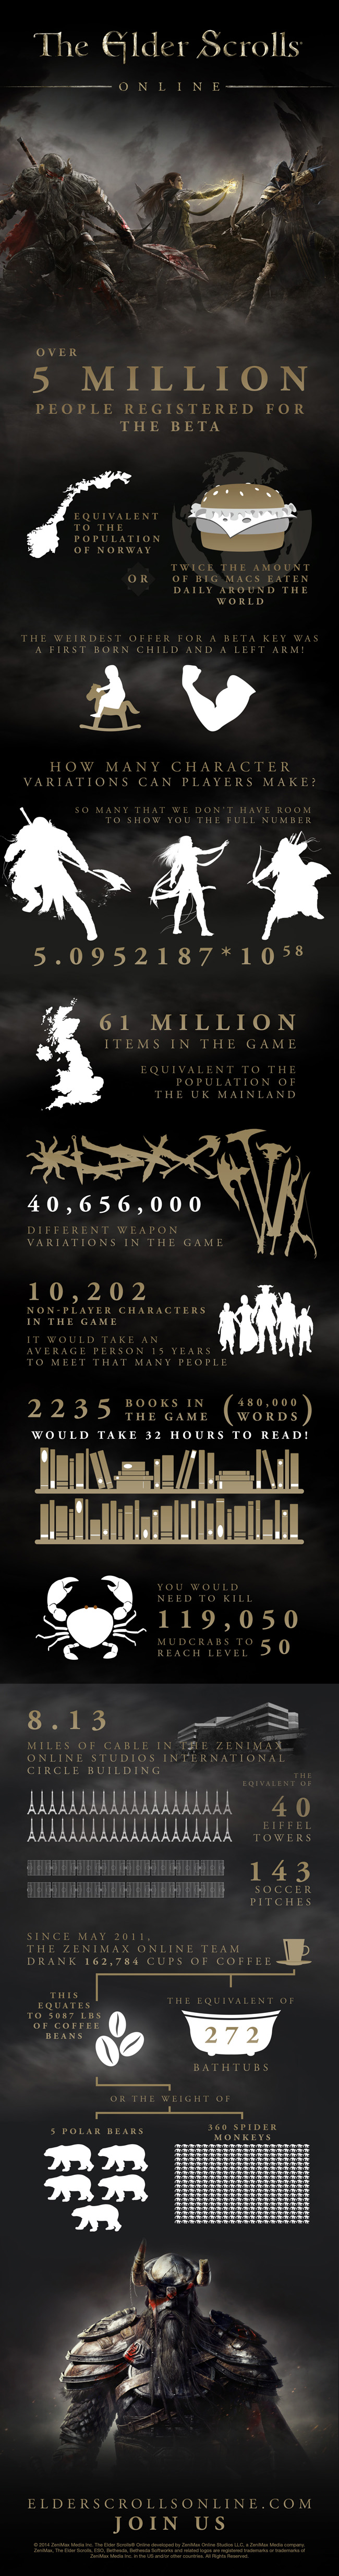 The-Elder-Scrolls-Online-infographic_Englishblogcheck1